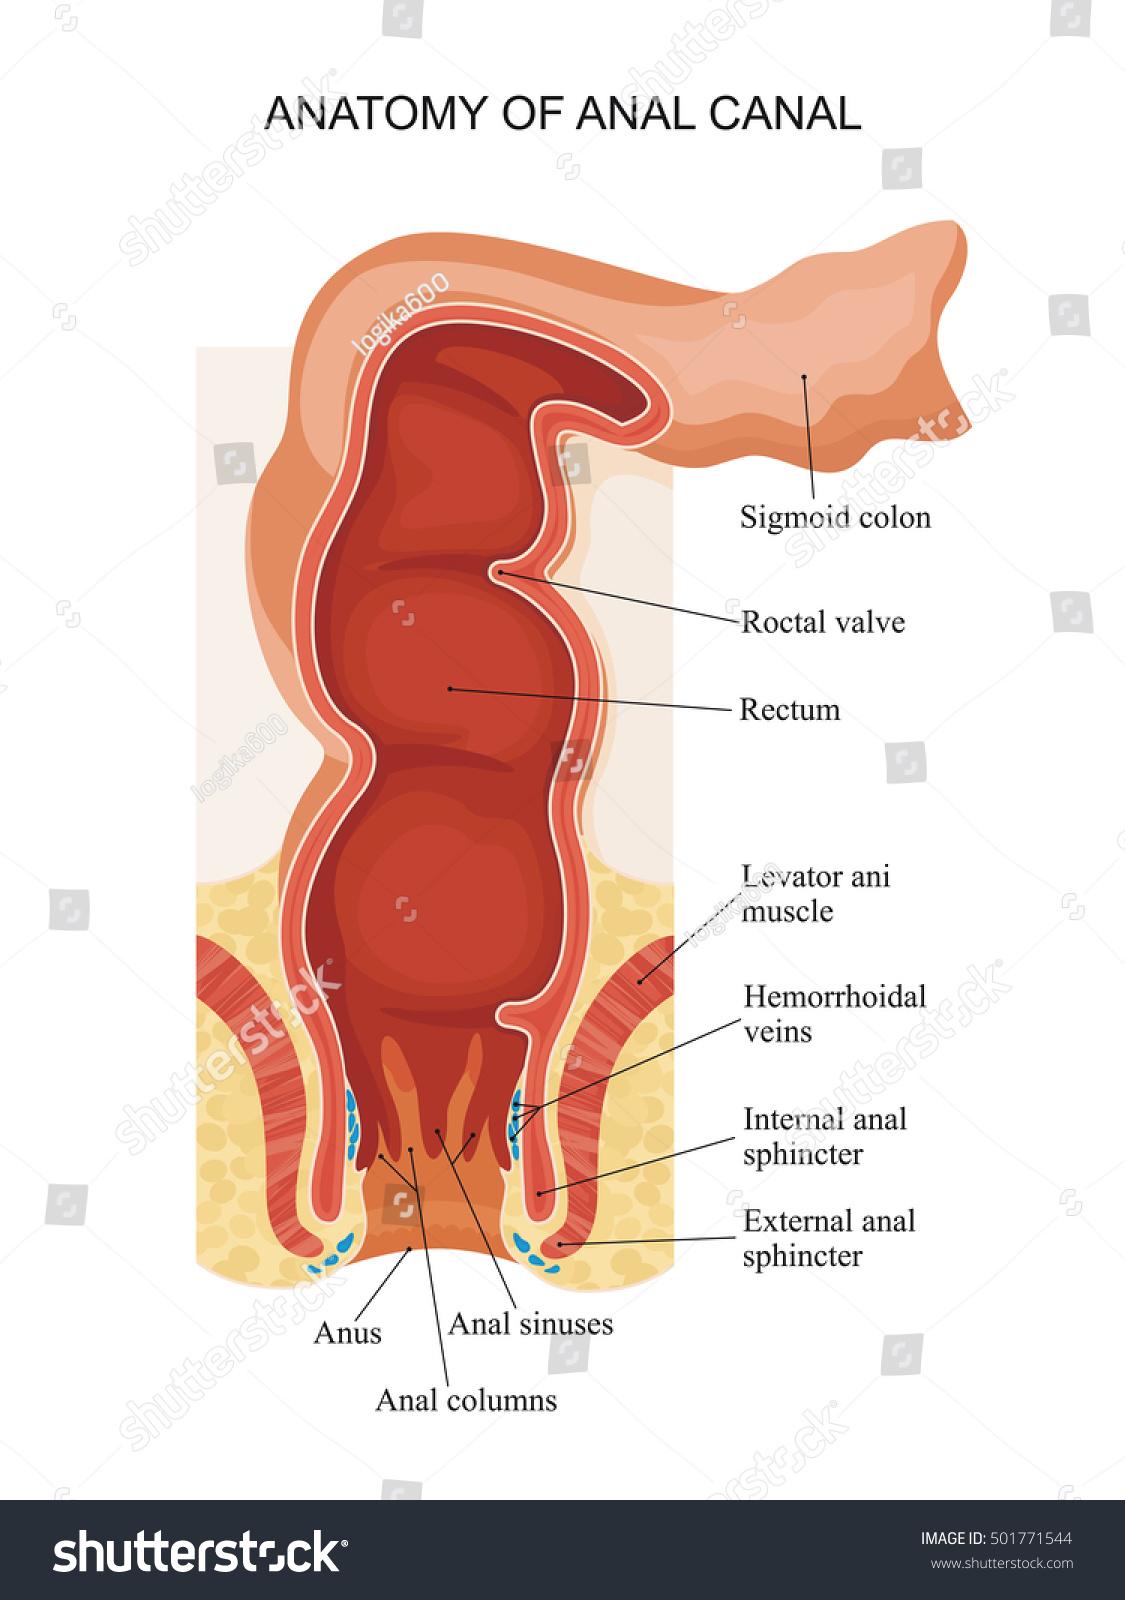 Anatomy Anal Canal Stock Illustration 501771544 Shutterstock